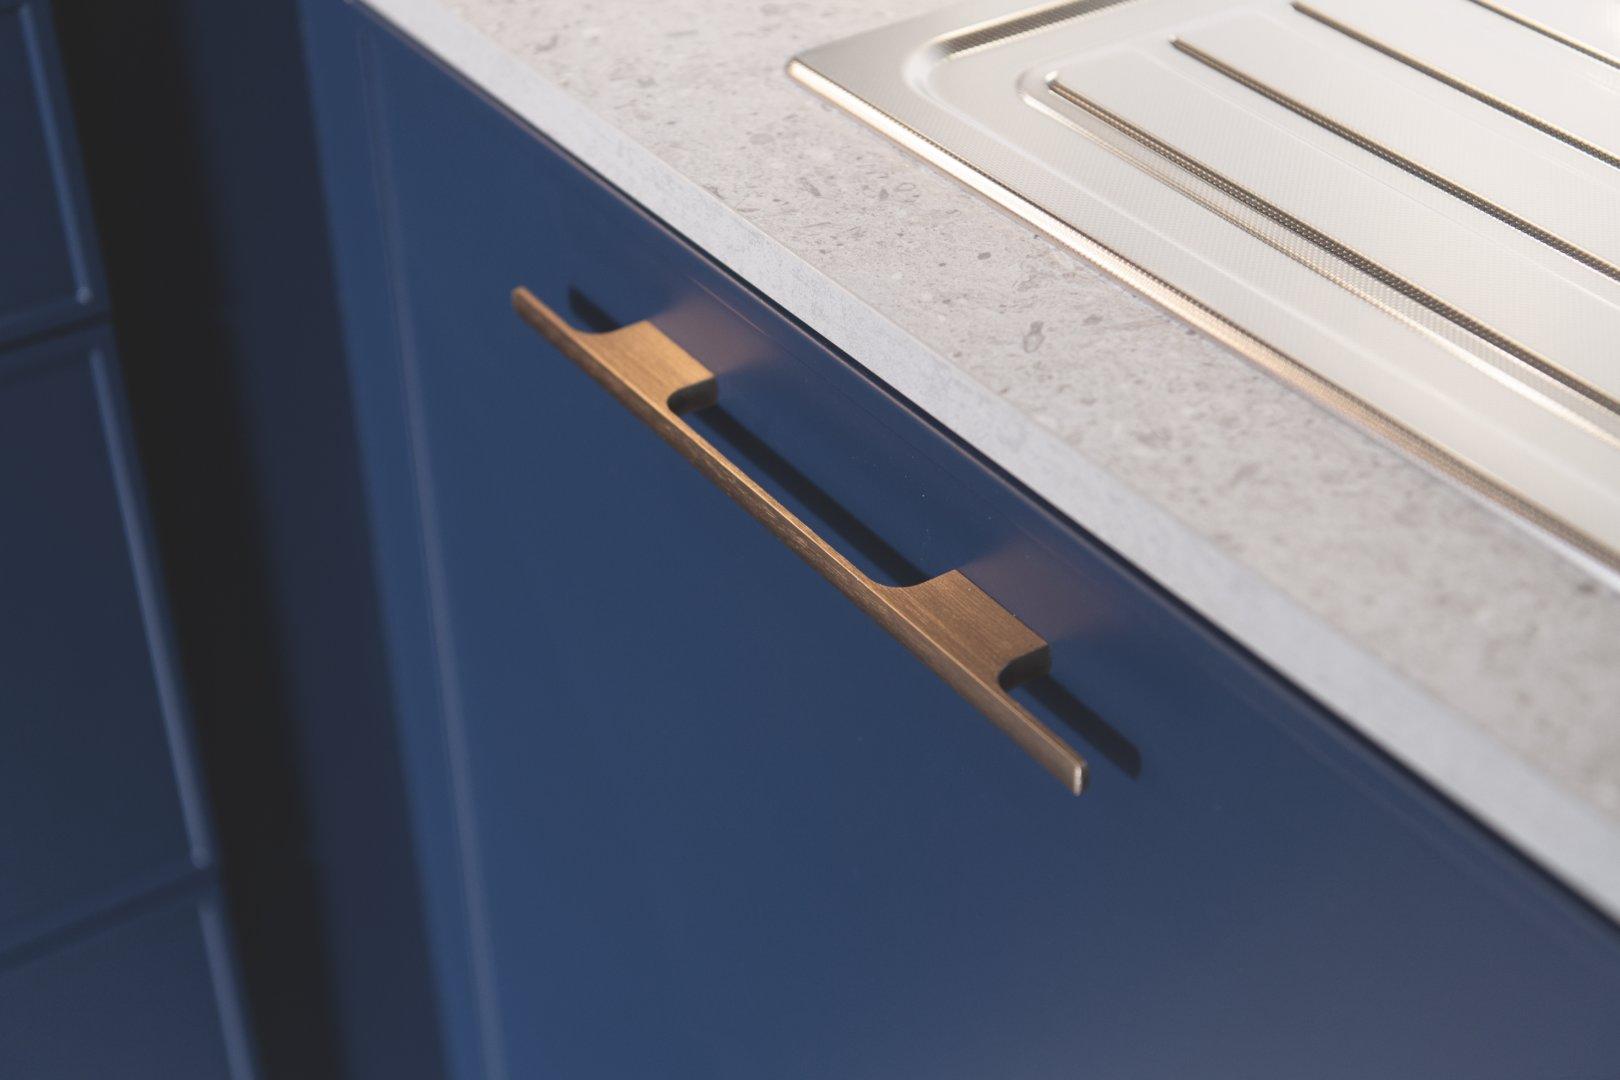 poignée dorée de meuble de cuisine